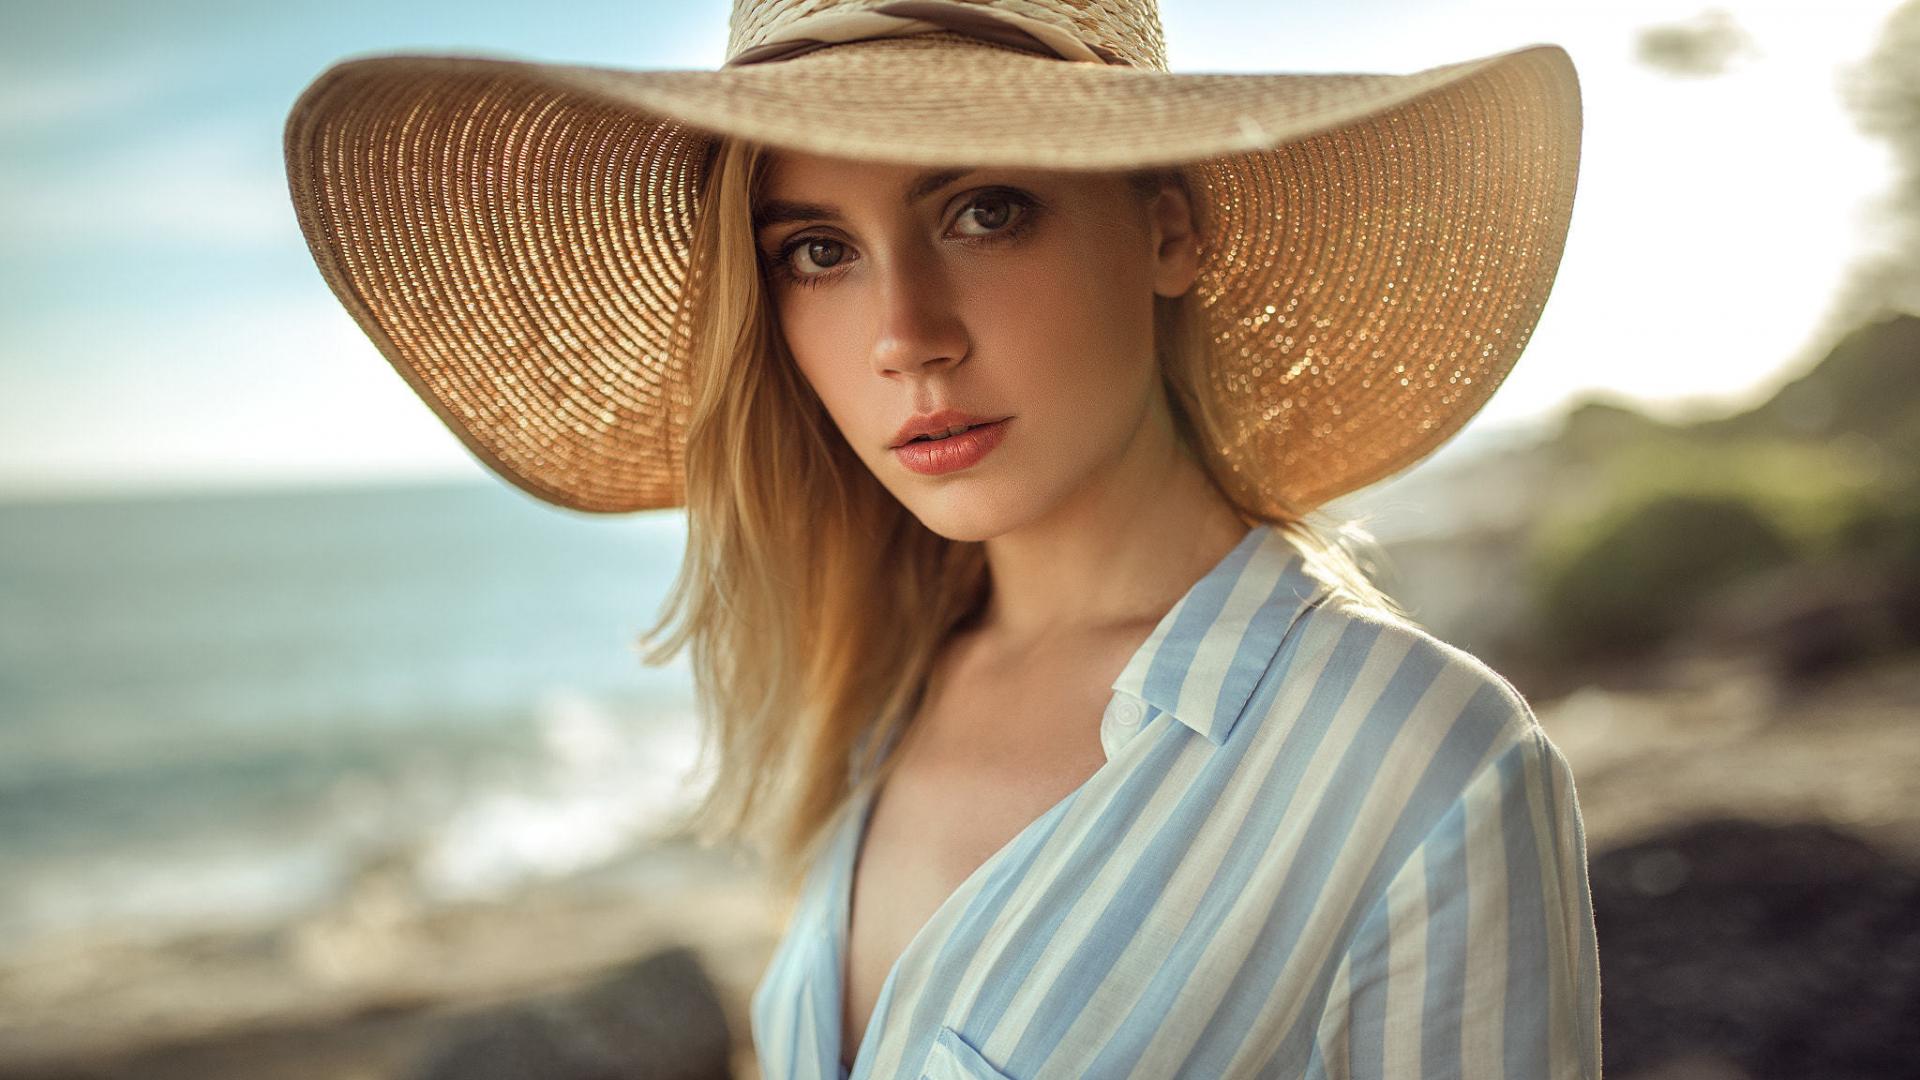 download 1920x1080 wallpaper ksenia kokoreva big straw hat girl